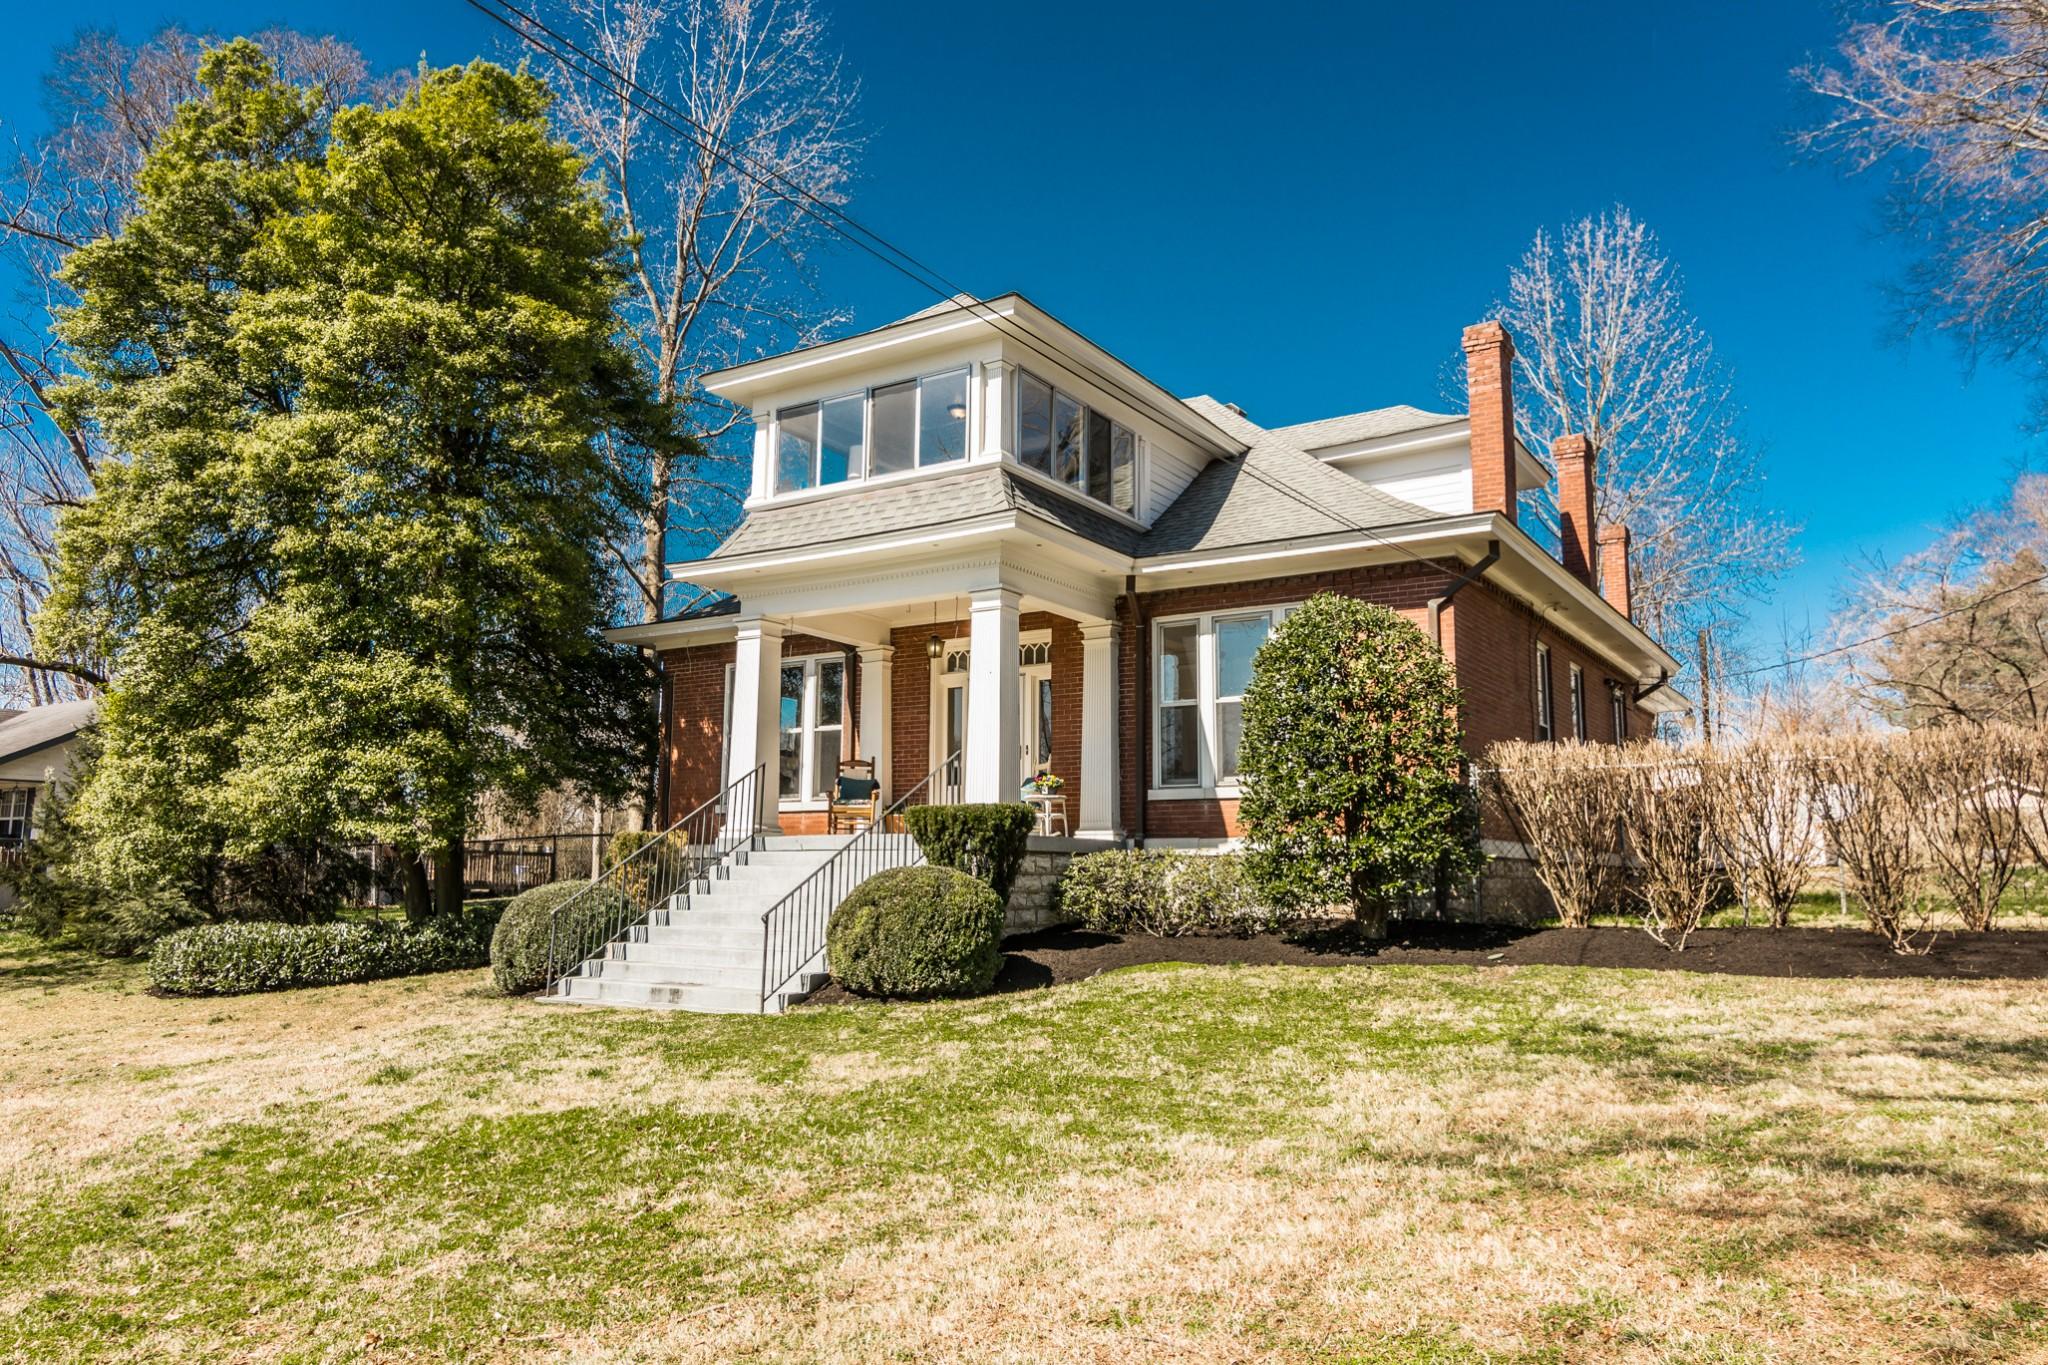 1717 Greenwood Ave Property Photo - Nashville, TN real estate listing